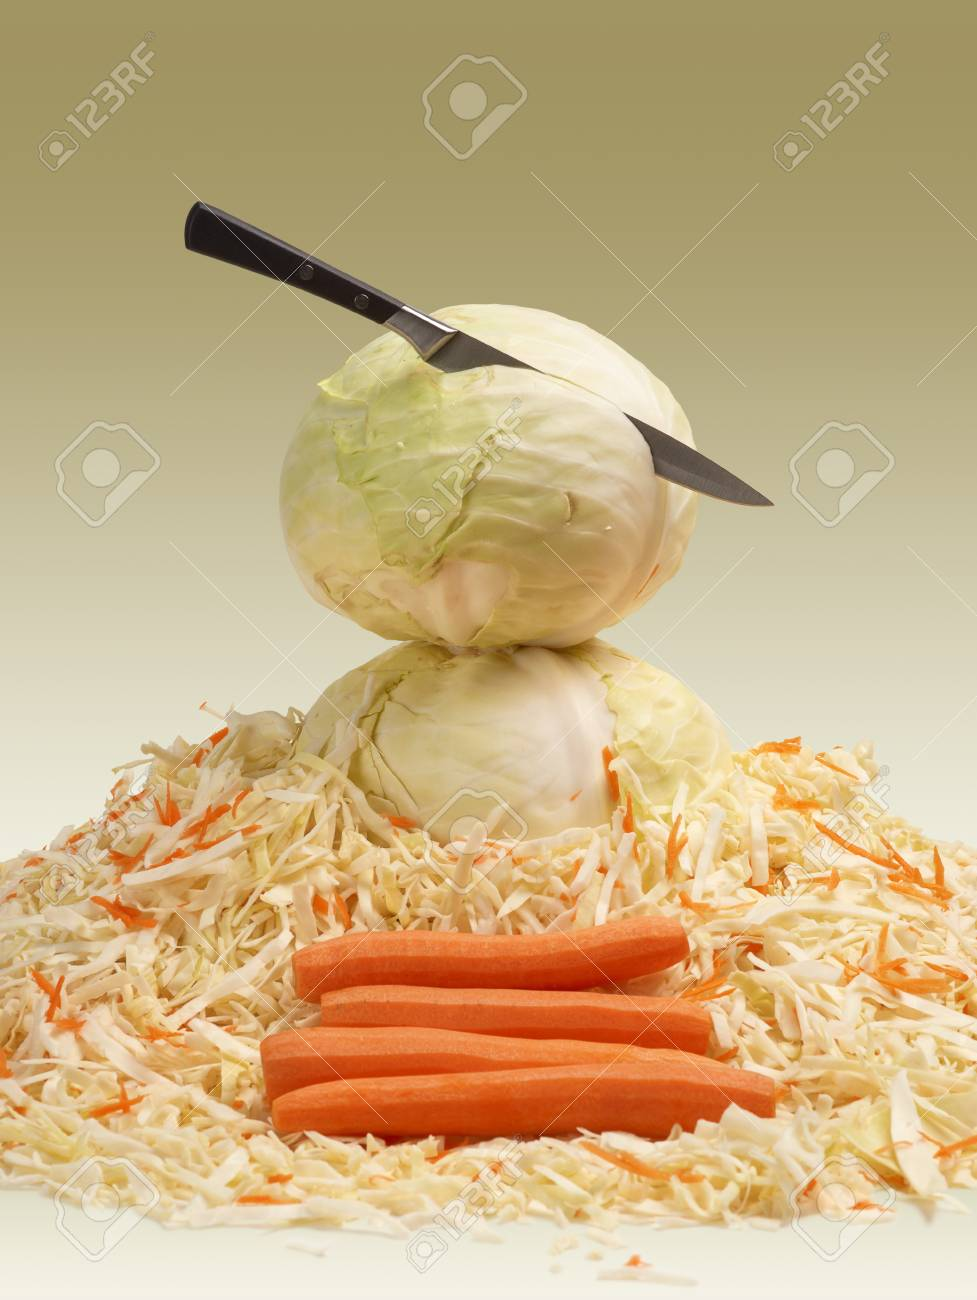 Hopping White Cabbage Stock Photo - 10592762